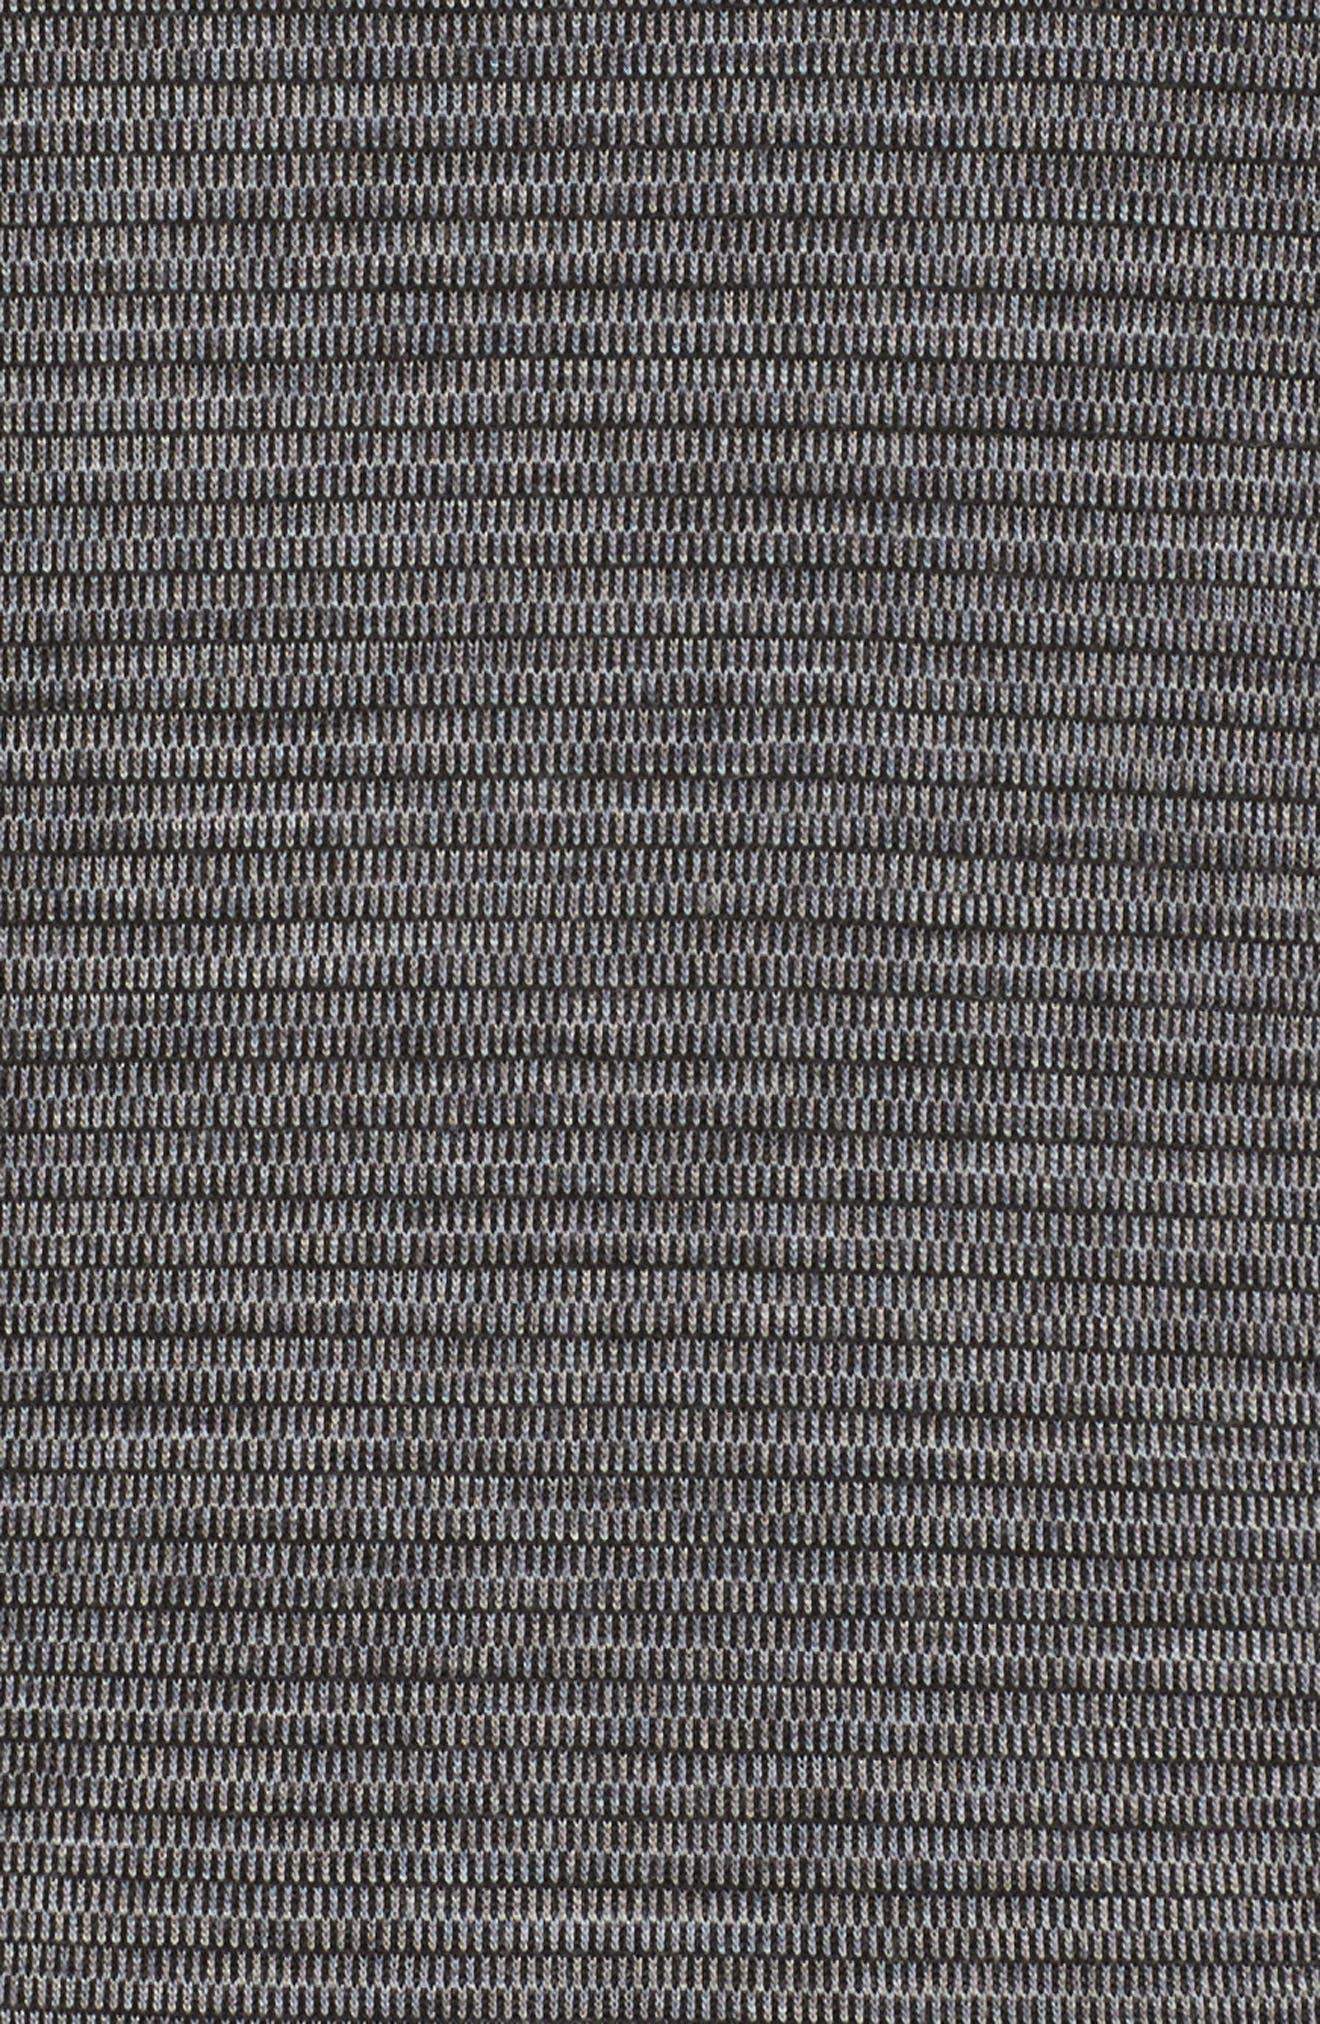 Merino 250Wool Base Layer Bottoms,                             Alternate thumbnail 6, color,                             Black/ Light Gray